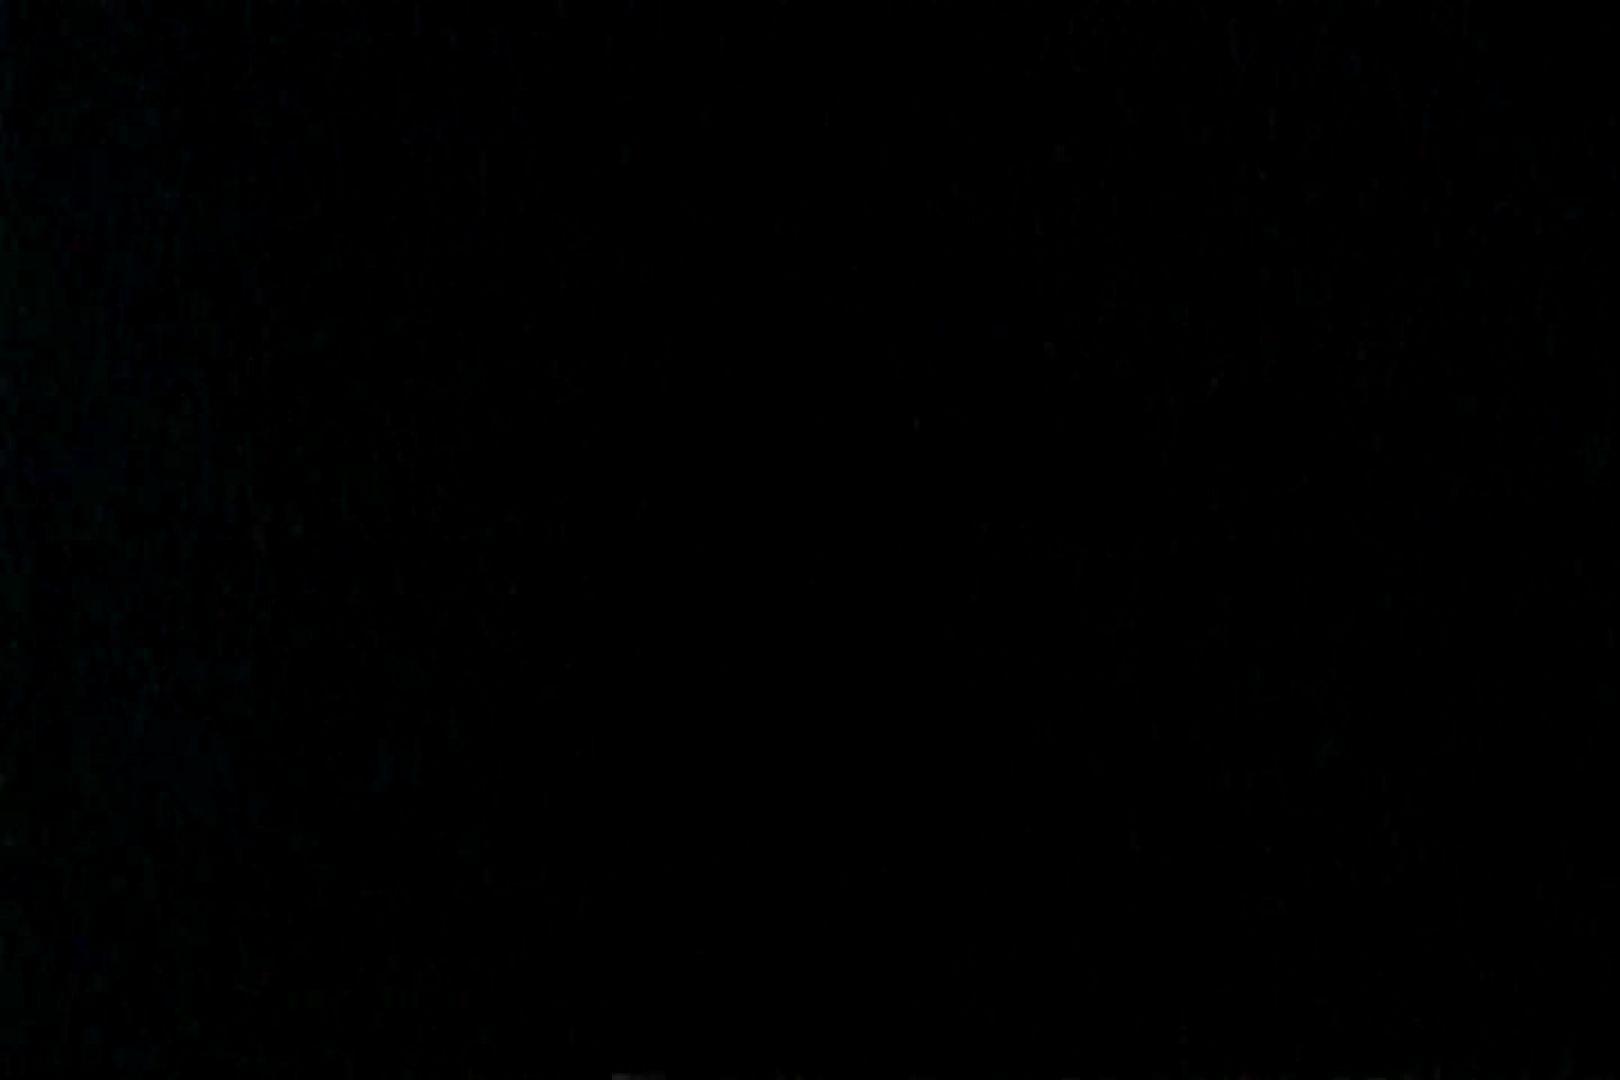 充血監督の深夜の運動会Vol.125 接写 オメコ無修正動画無料 63画像 45